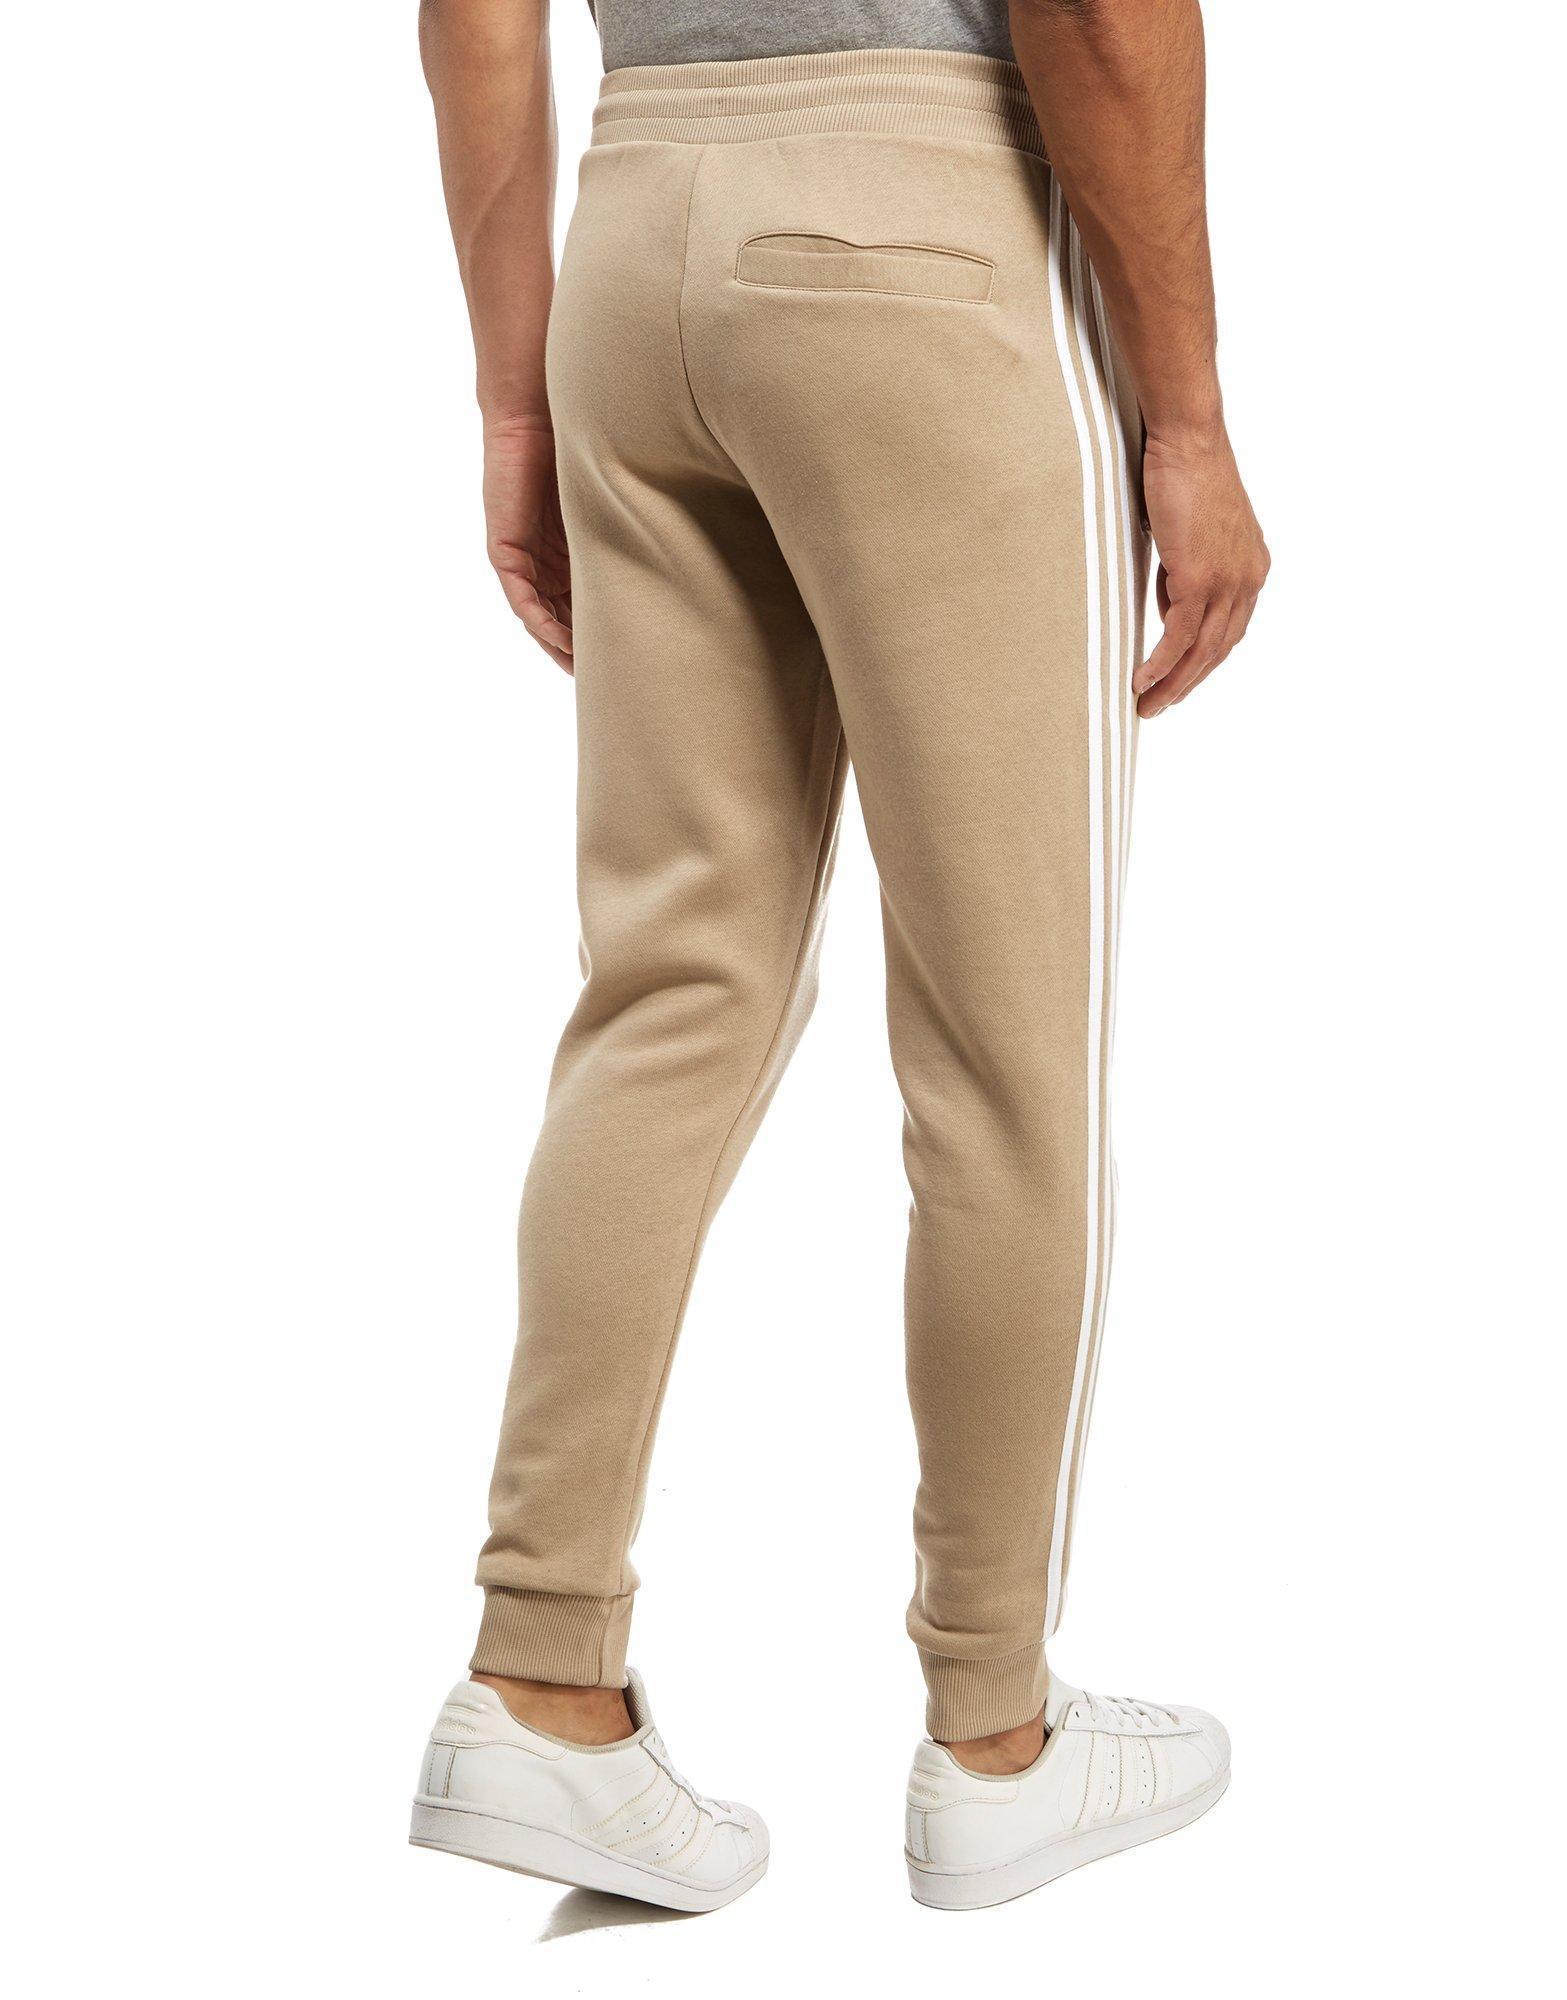 99a44e5981 Adidas Originals California Fleece Pants Brown - Best Style Pants ...